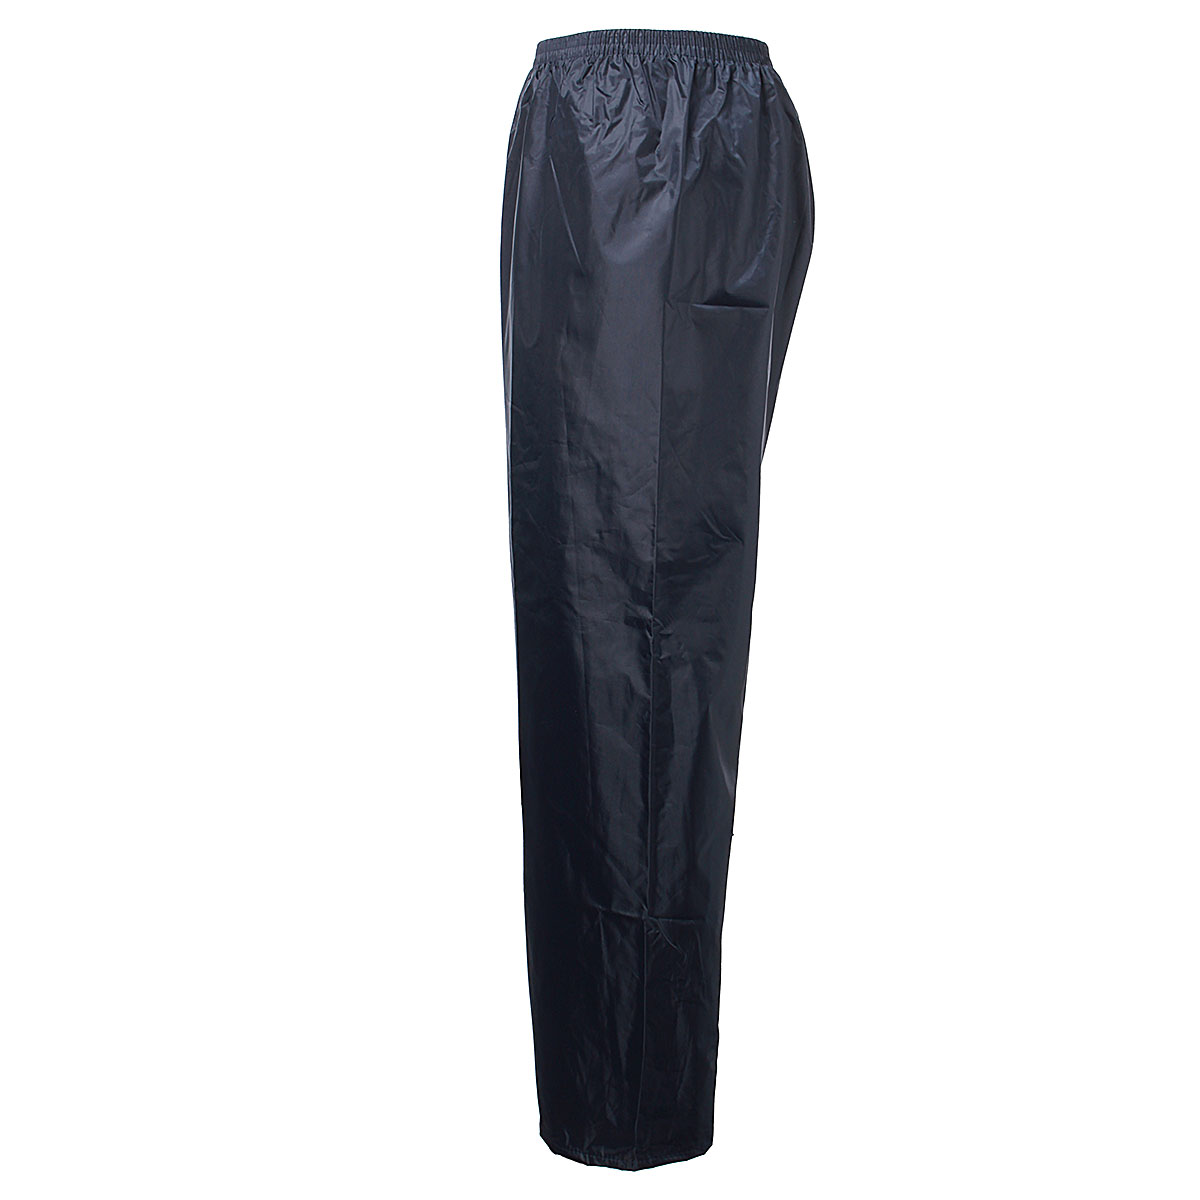 Men Women Outdoor Cycling Climbing Rain Pants Waterproof Windproof Trousers Navy New Bicycle Pants Windproof Bike Trousers